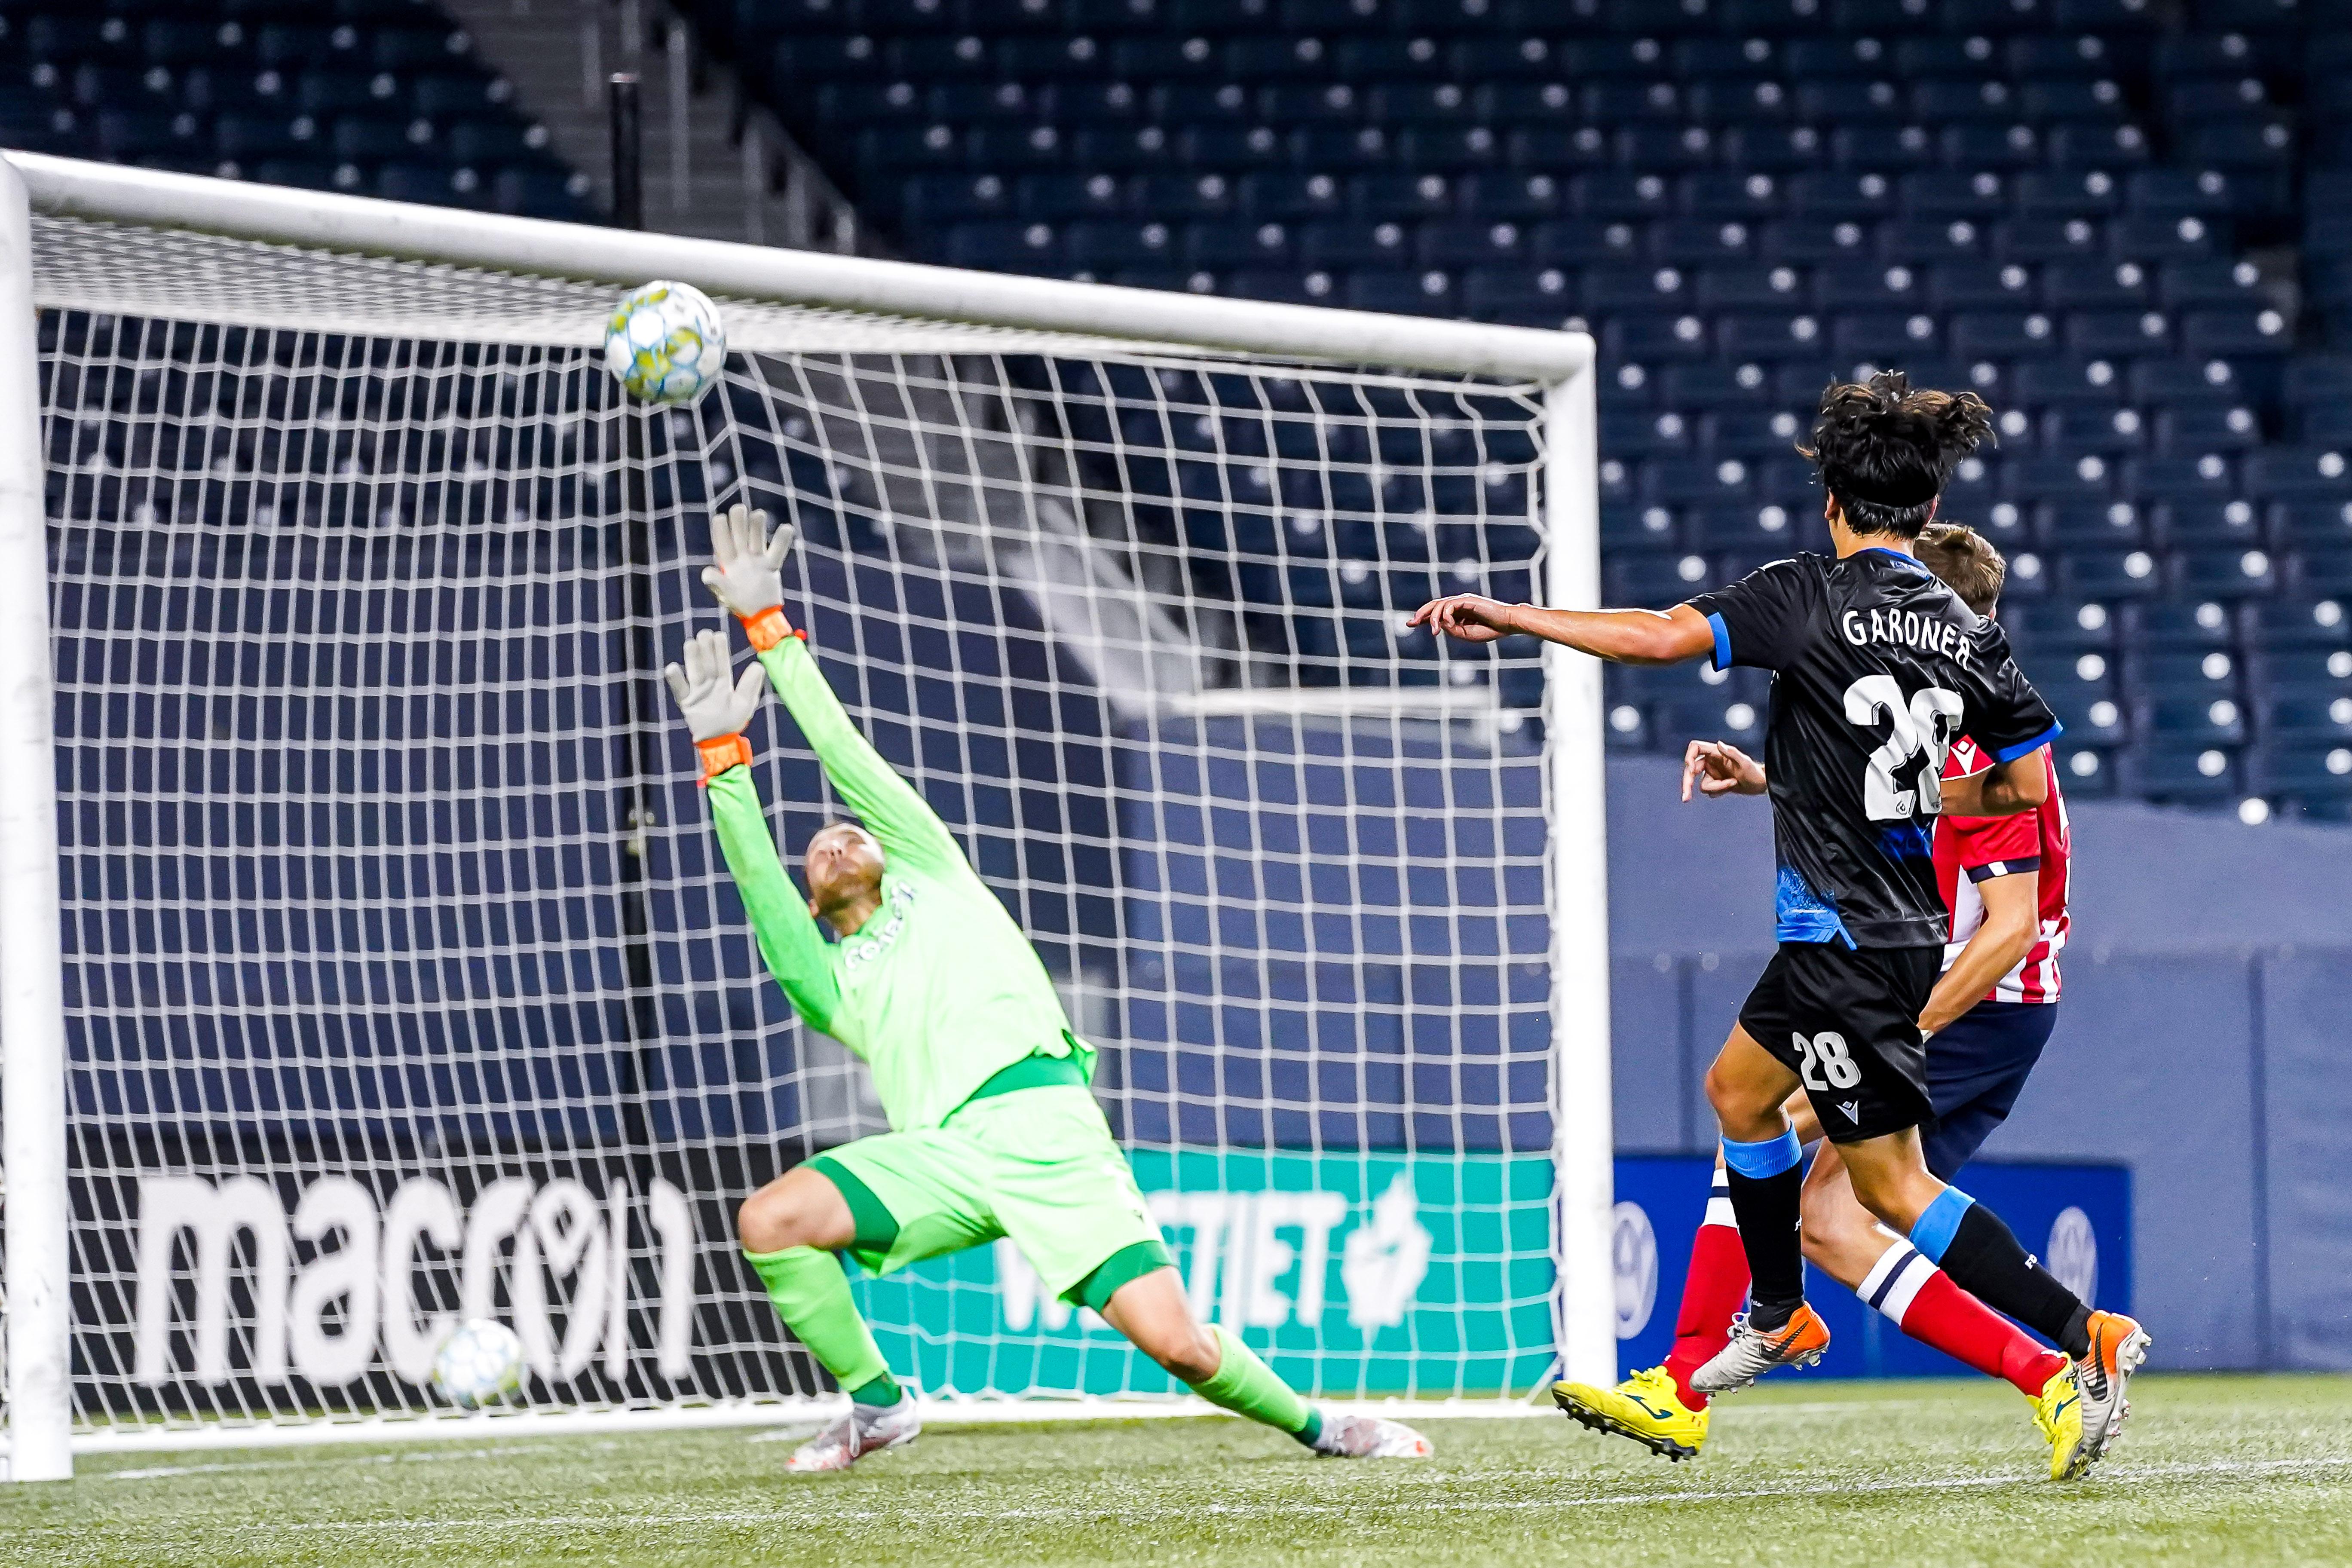 July 18, 2021. Atlético Ottawa vs FC Edmonton. First-Half. Goalkeeper Dylon Powley of Atlético Ottawa redirects the ball over the net as Thomas Gardner of FC Edmonton looks on.